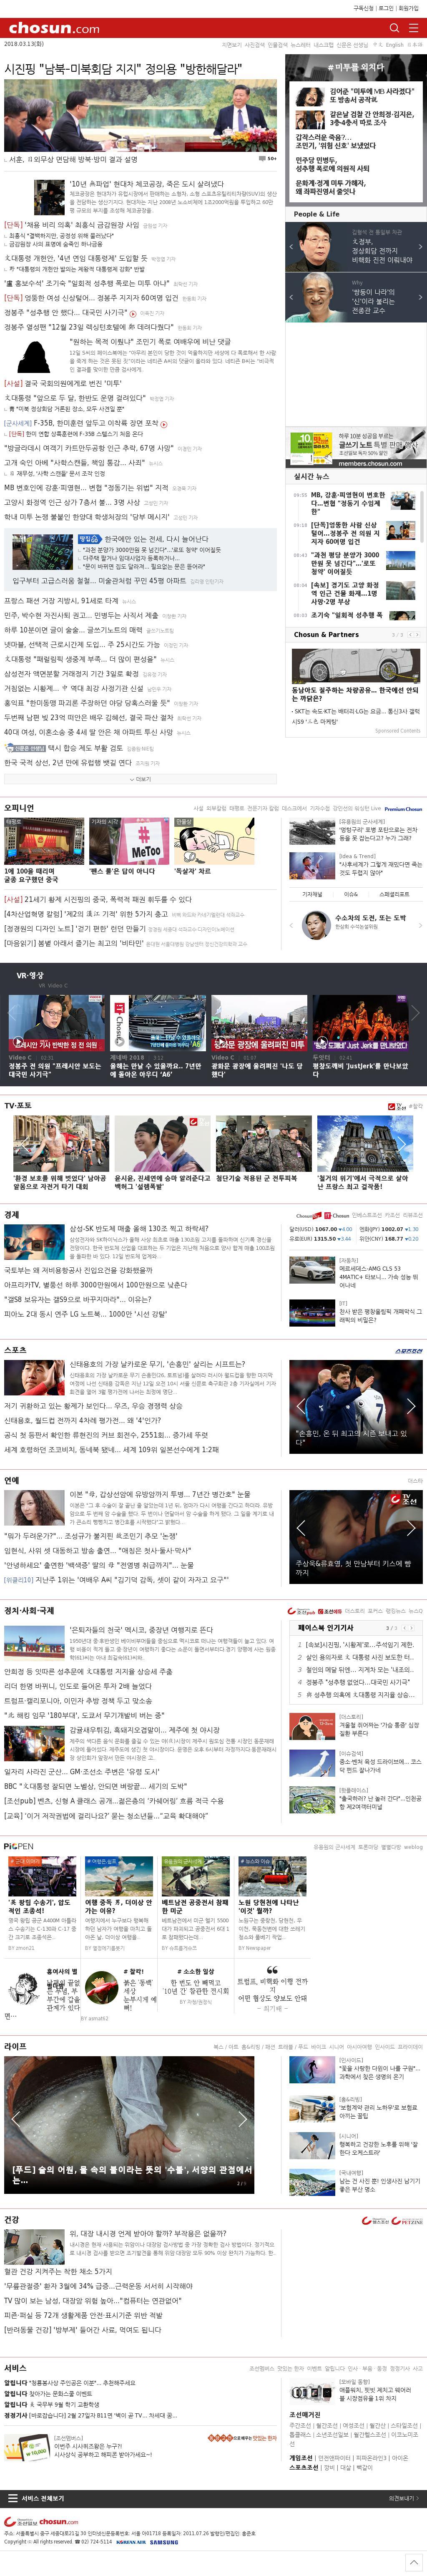 chosun.com at Monday March 12, 2018, 5:03 p.m. UTC